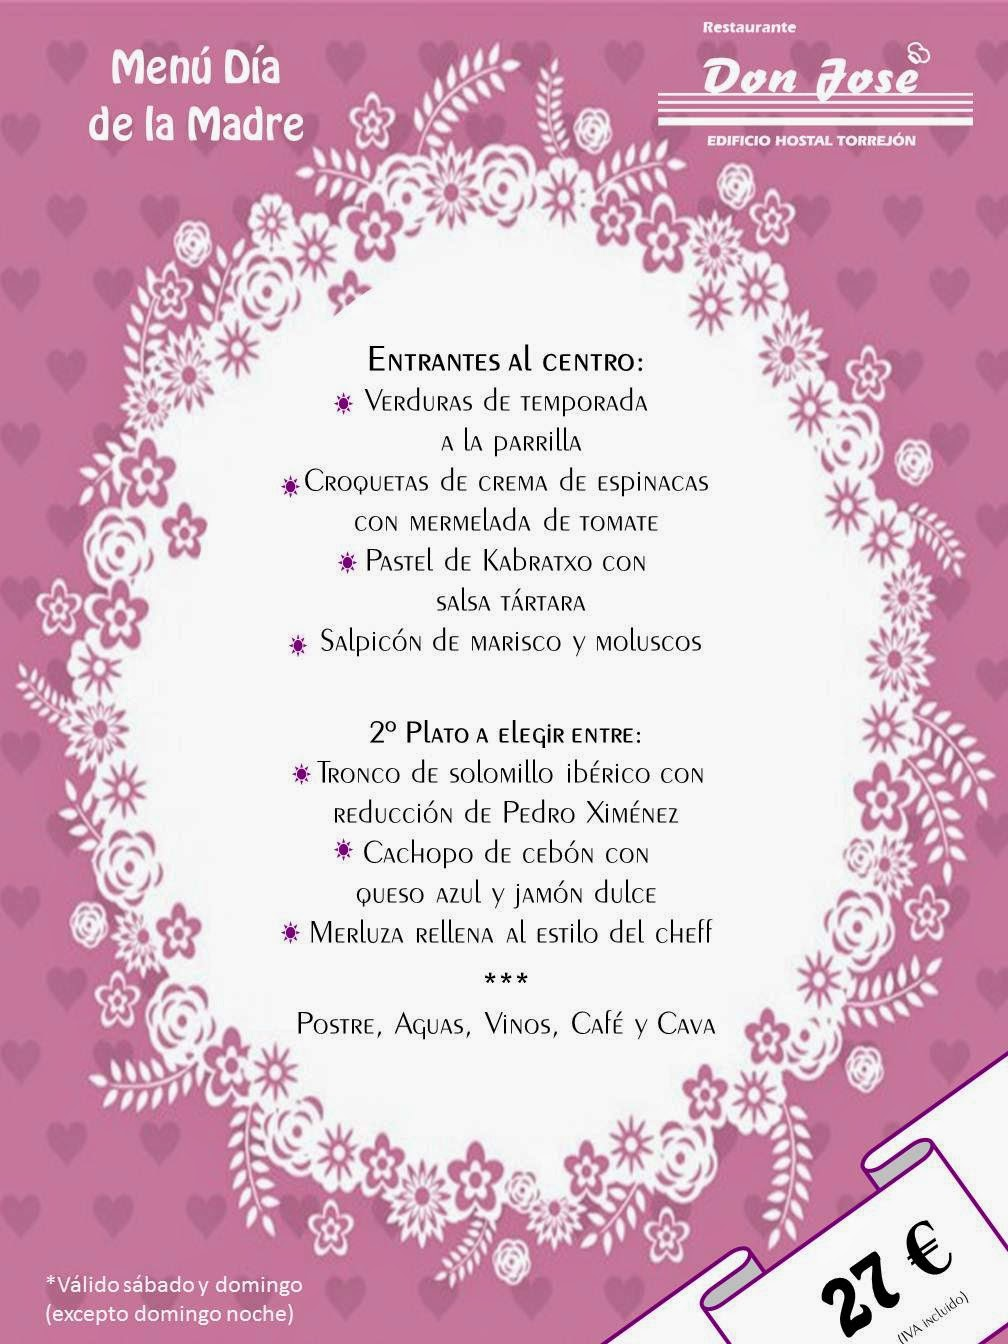 menu_madre_torrejon_don_jose